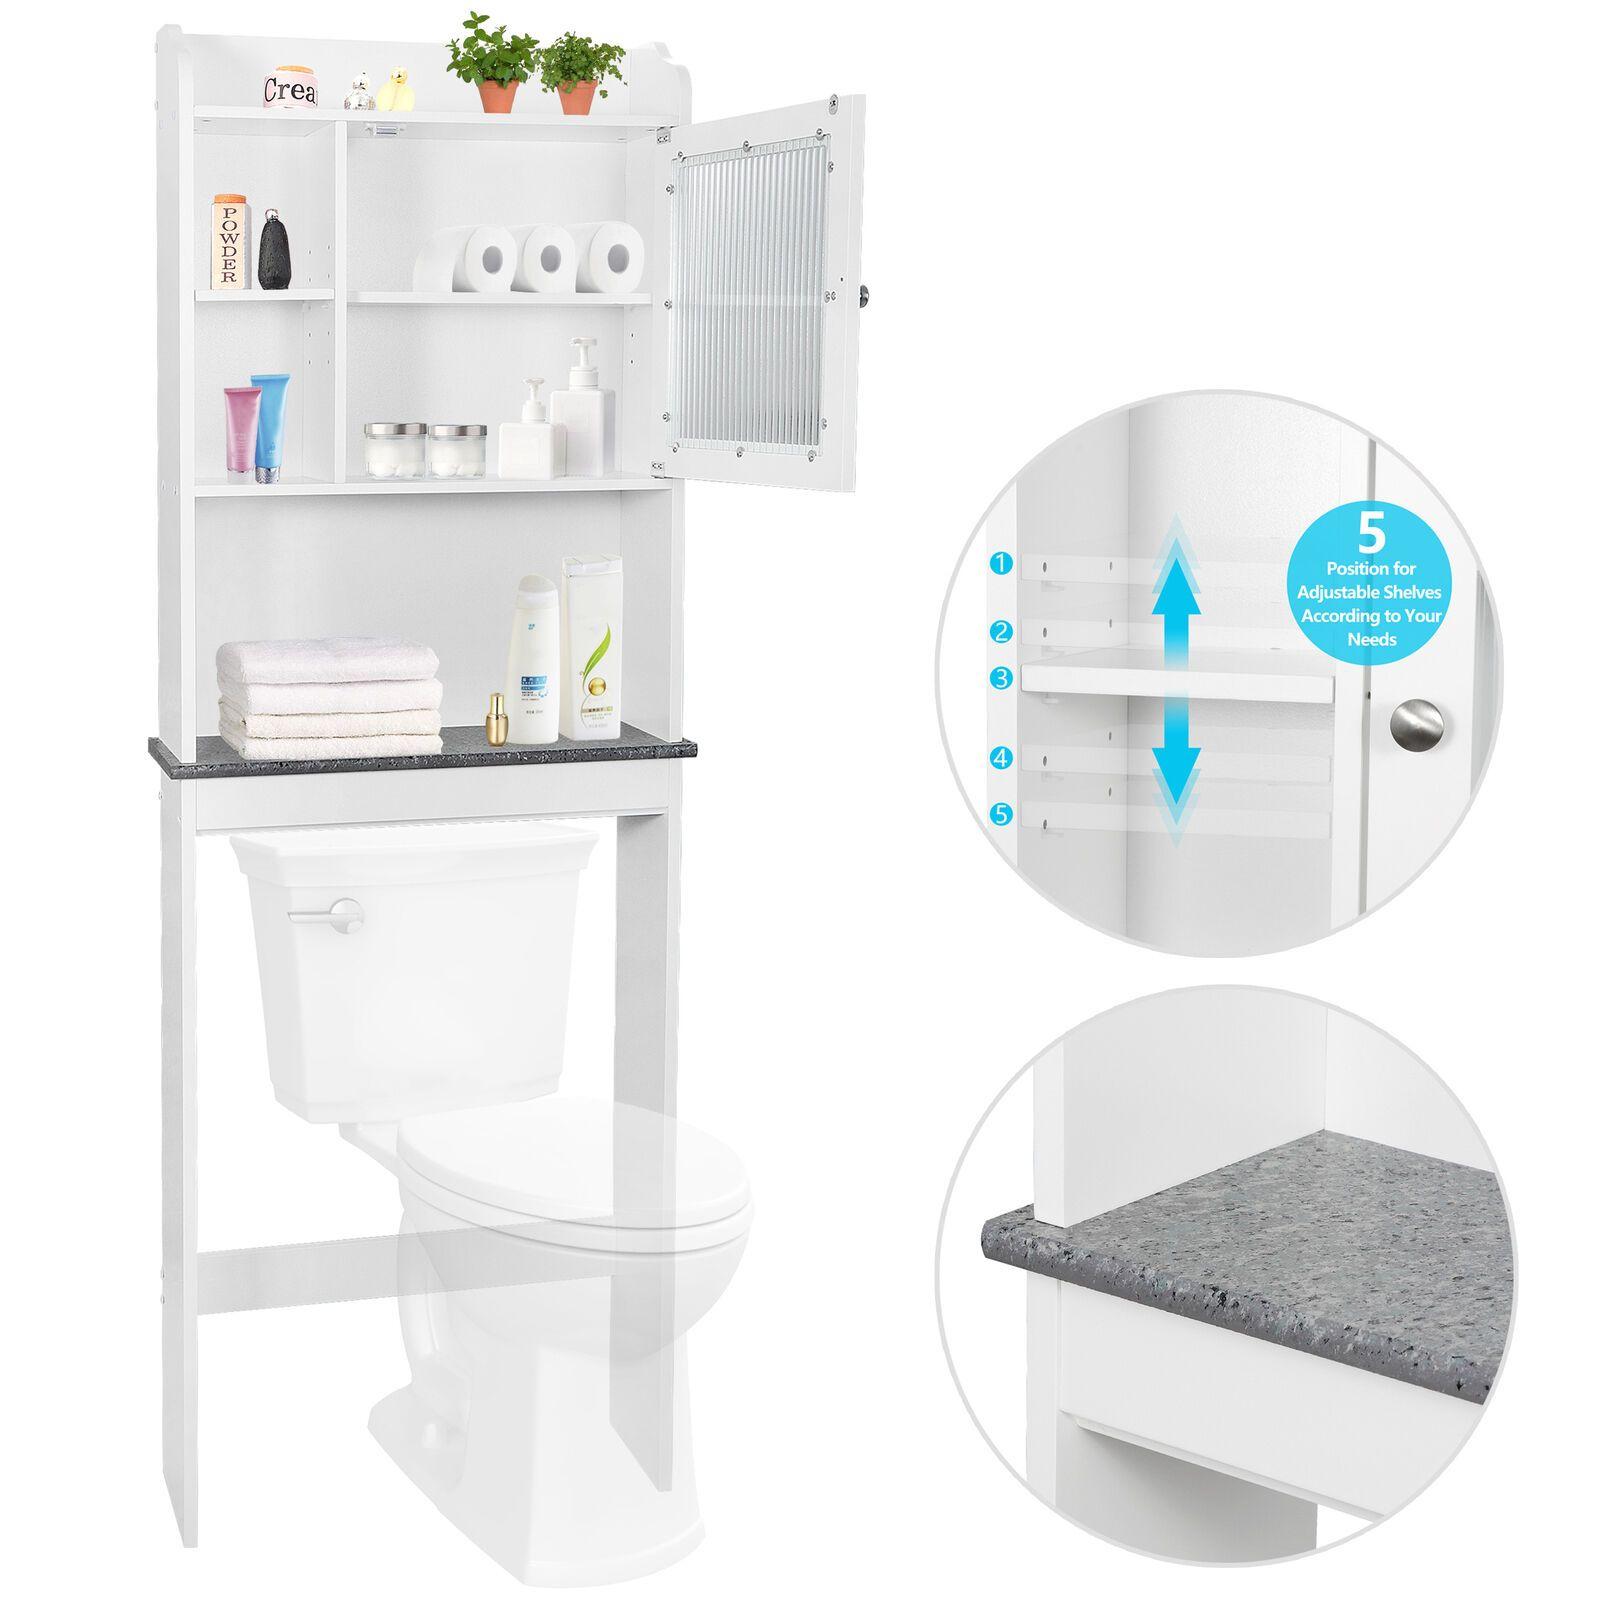 Details About New 3 Shelf Over The Toilet Bathroom Space Saver Organizer Towel Storage Rack Us Bathroom Space Saver Storage Cabinet Shelves Bathroom Organisation